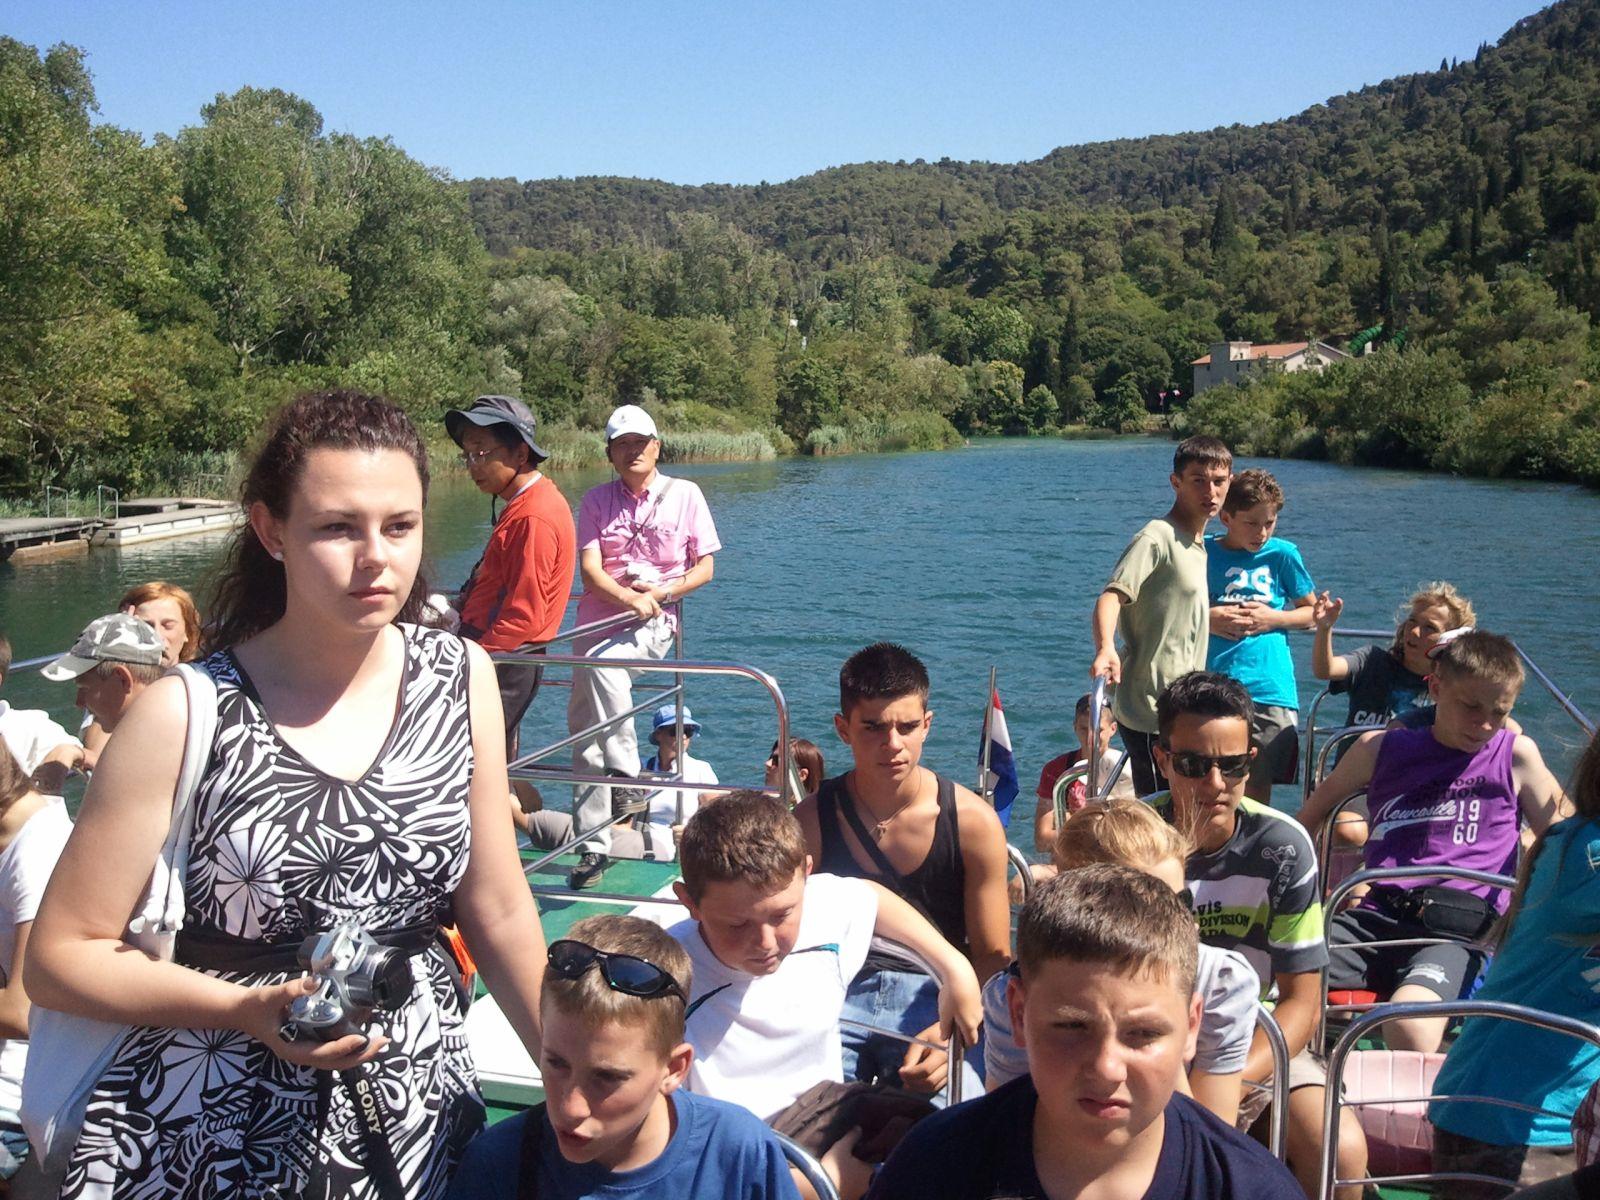 Ljepote sjeverne Dalmacije: Nacionalni park Krka: vožnja brodom